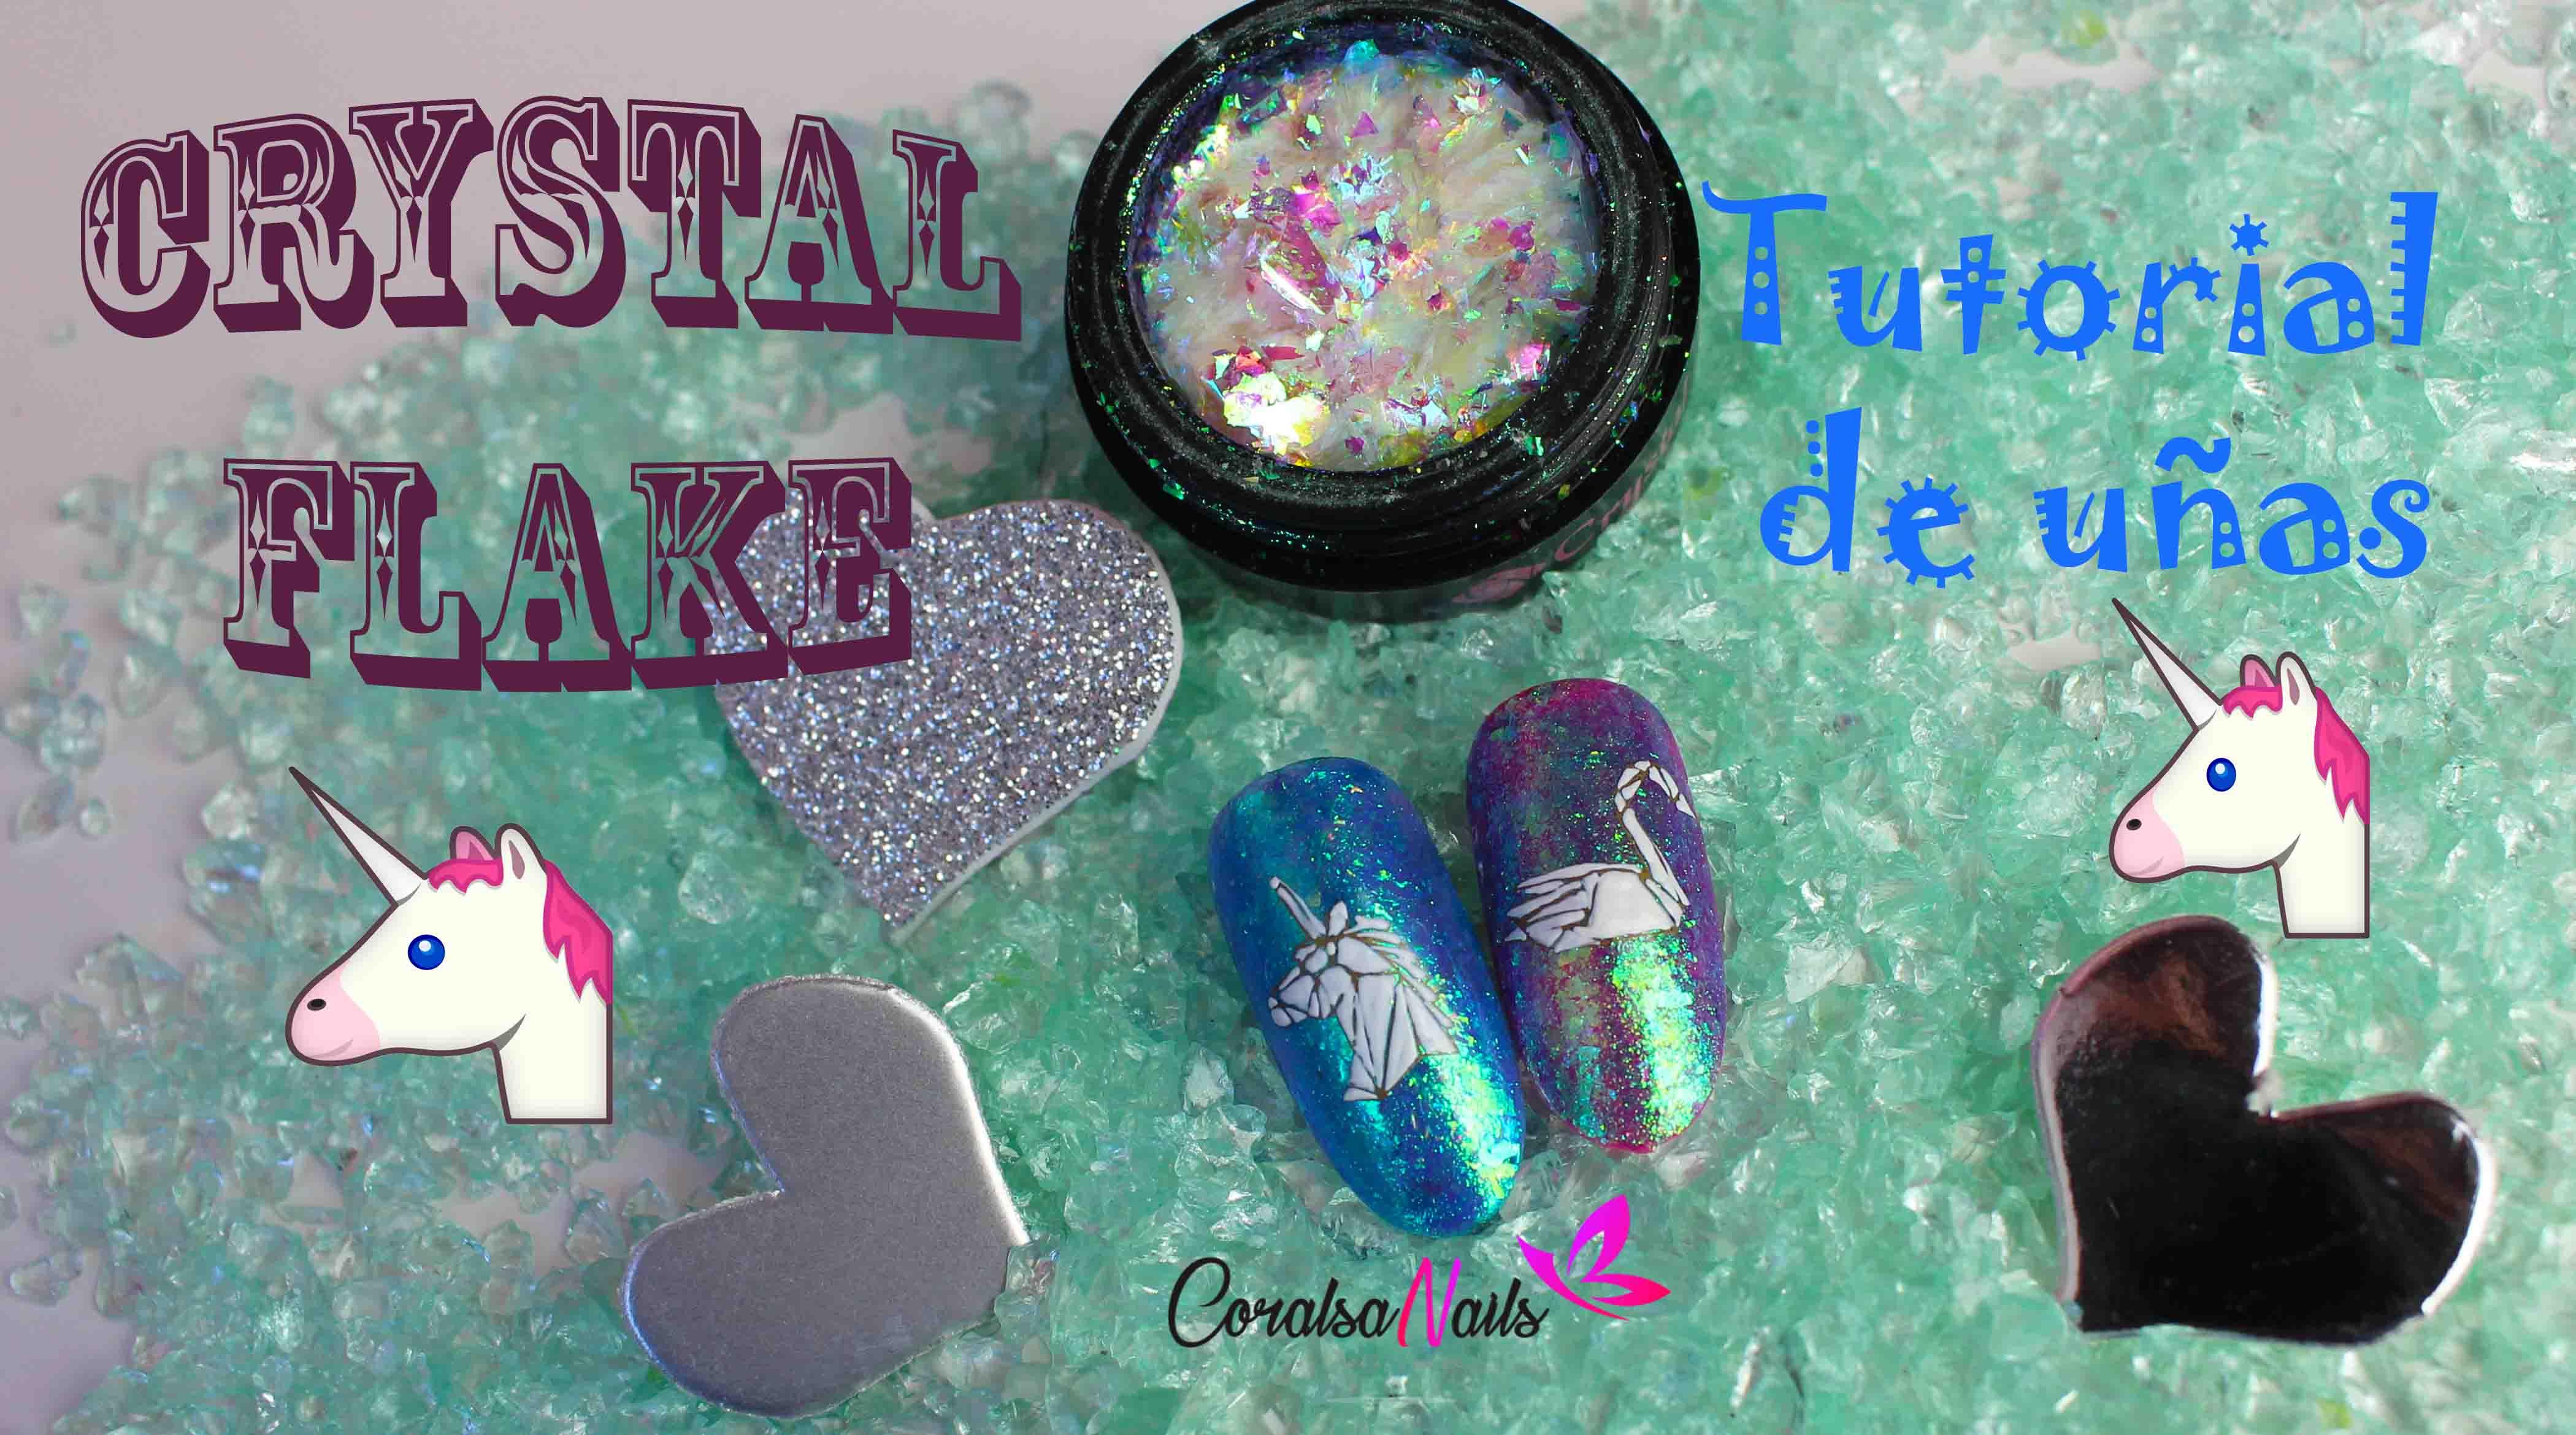 Crystal Flake y Diseño Unicornio